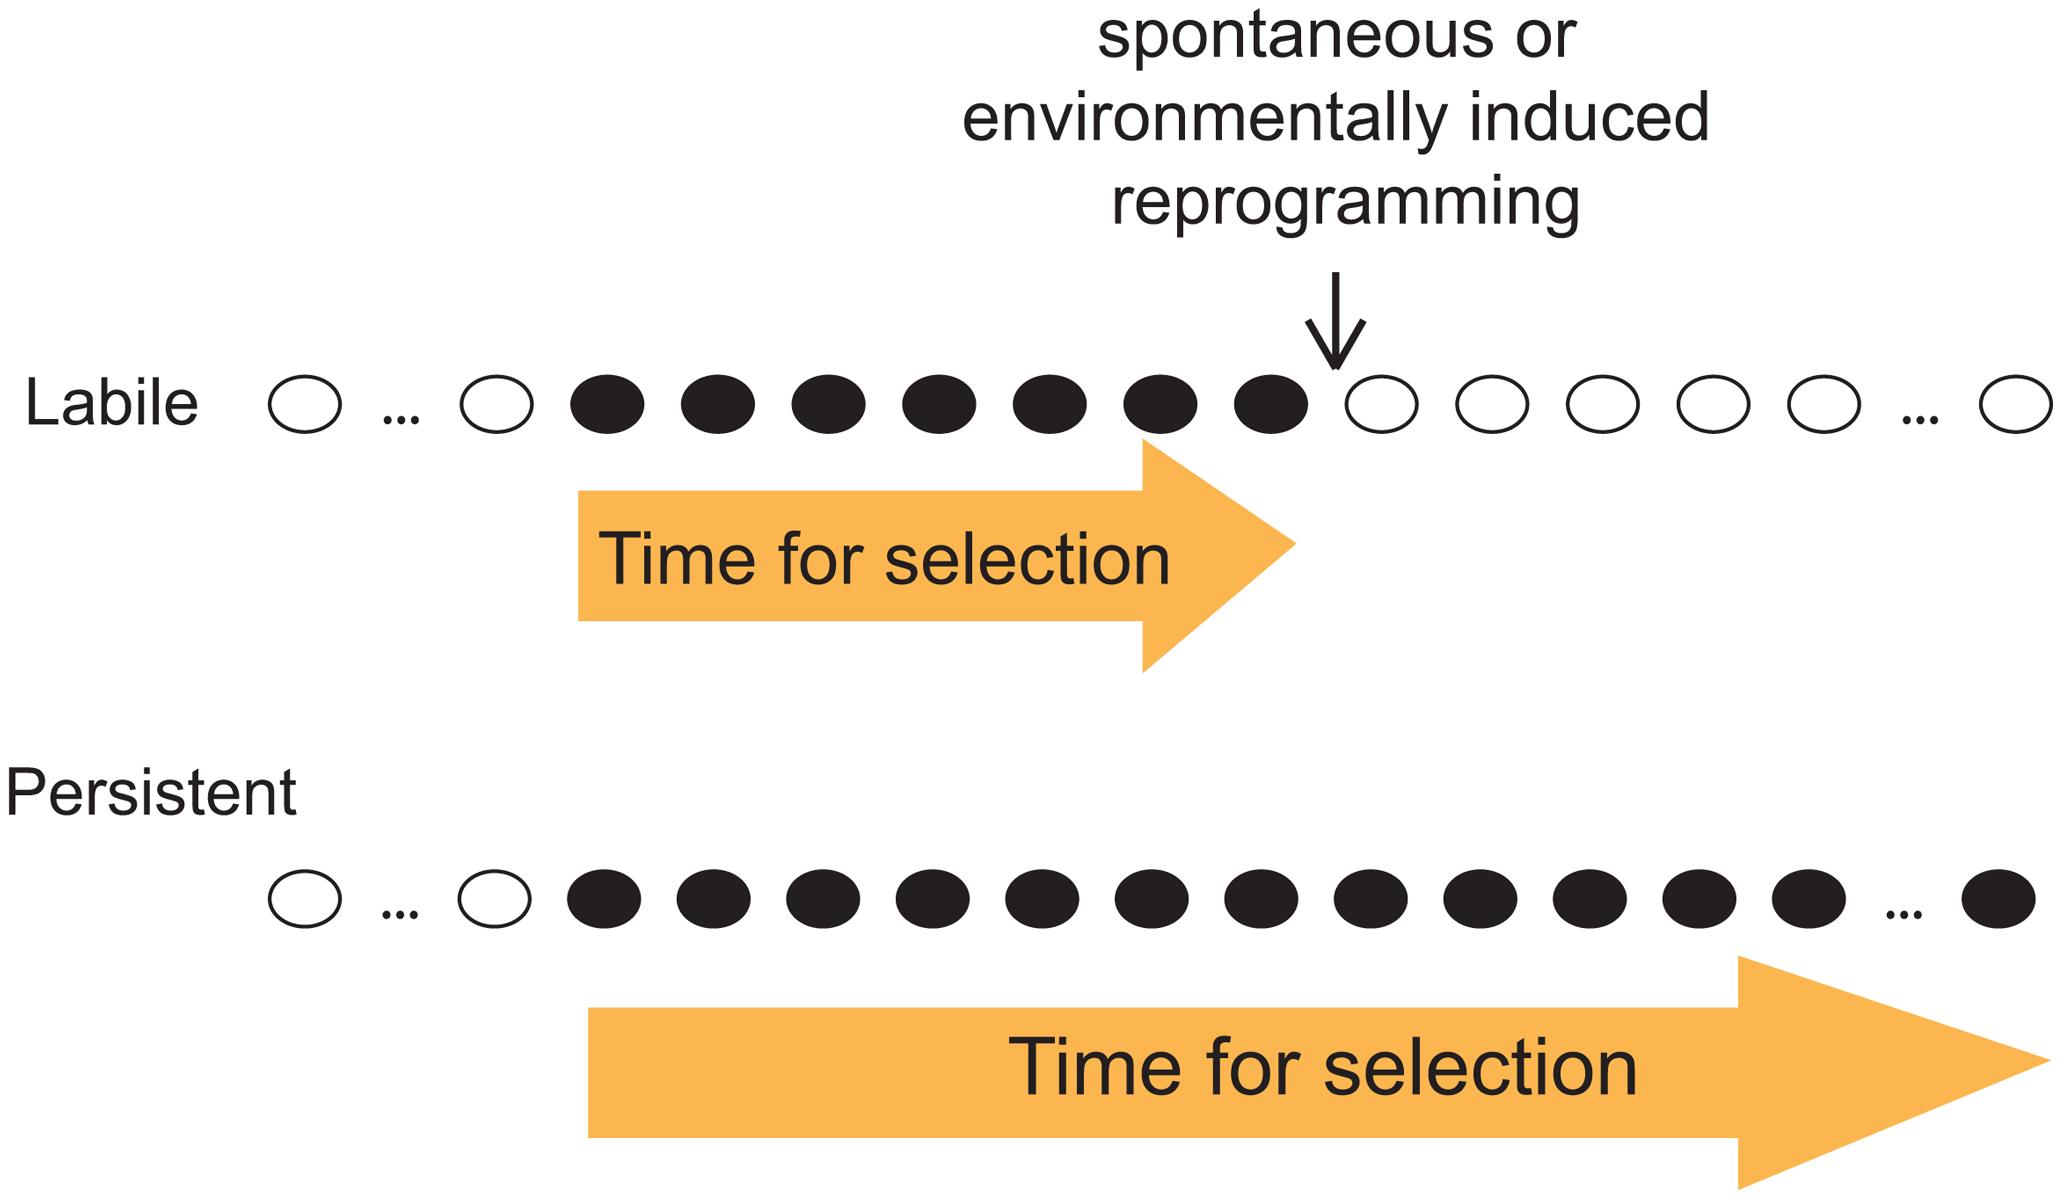 Distinct evolutionary implication of labile and persistent epi-polymorphisms.